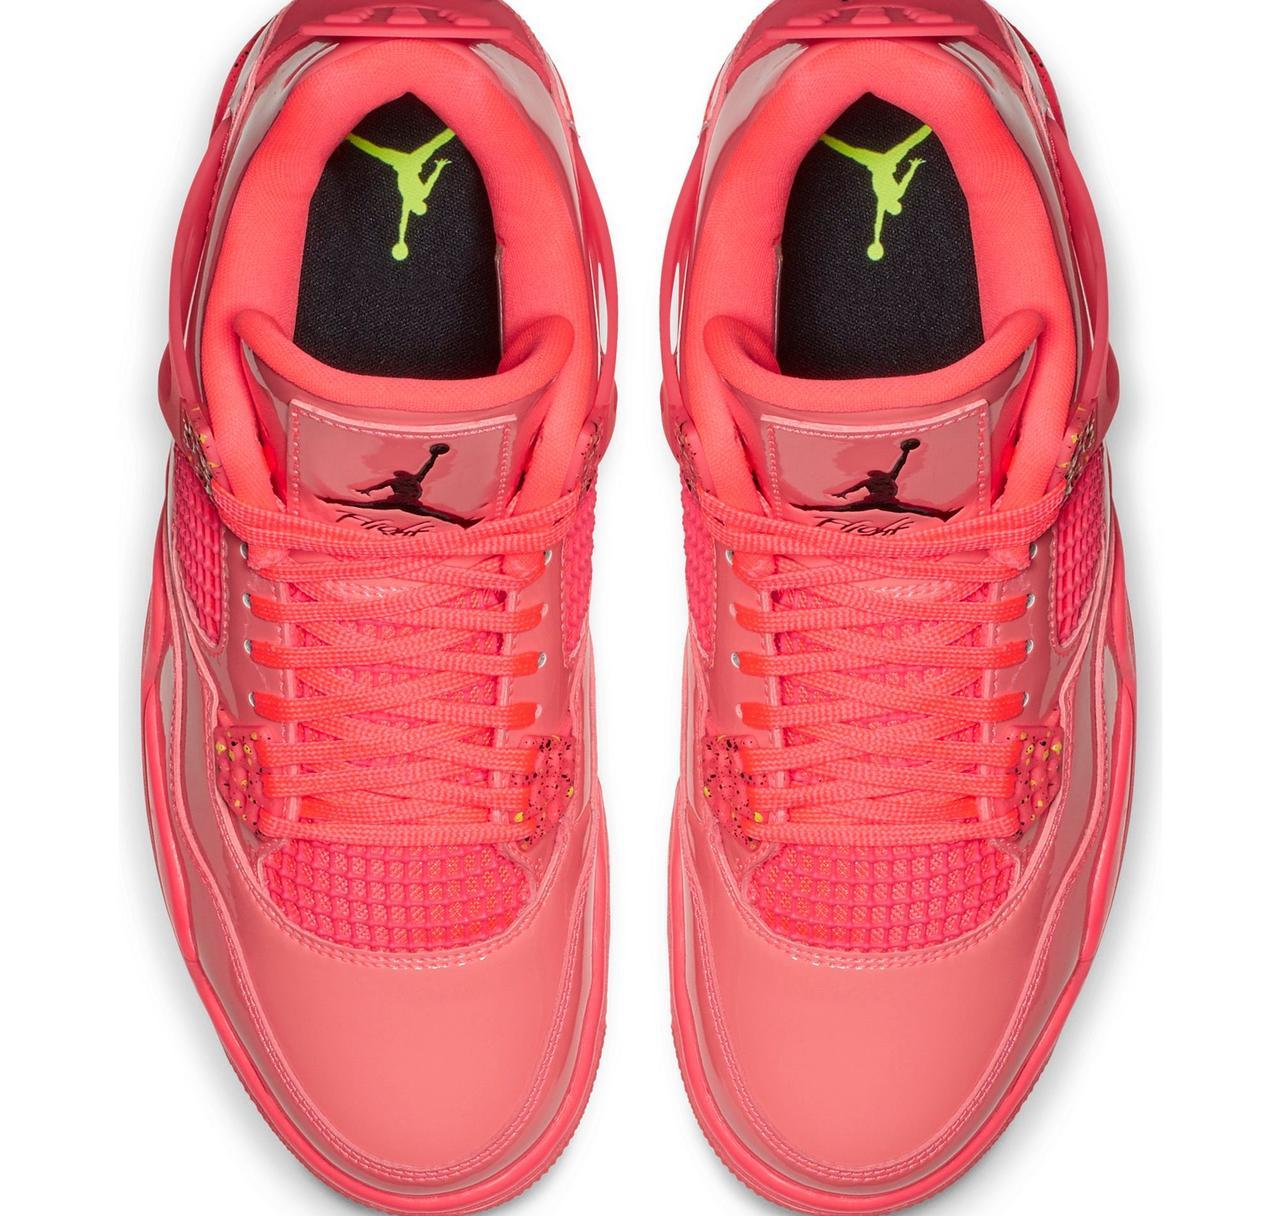 94caa3ede847 Sneaker Release  Jordan Retro 4